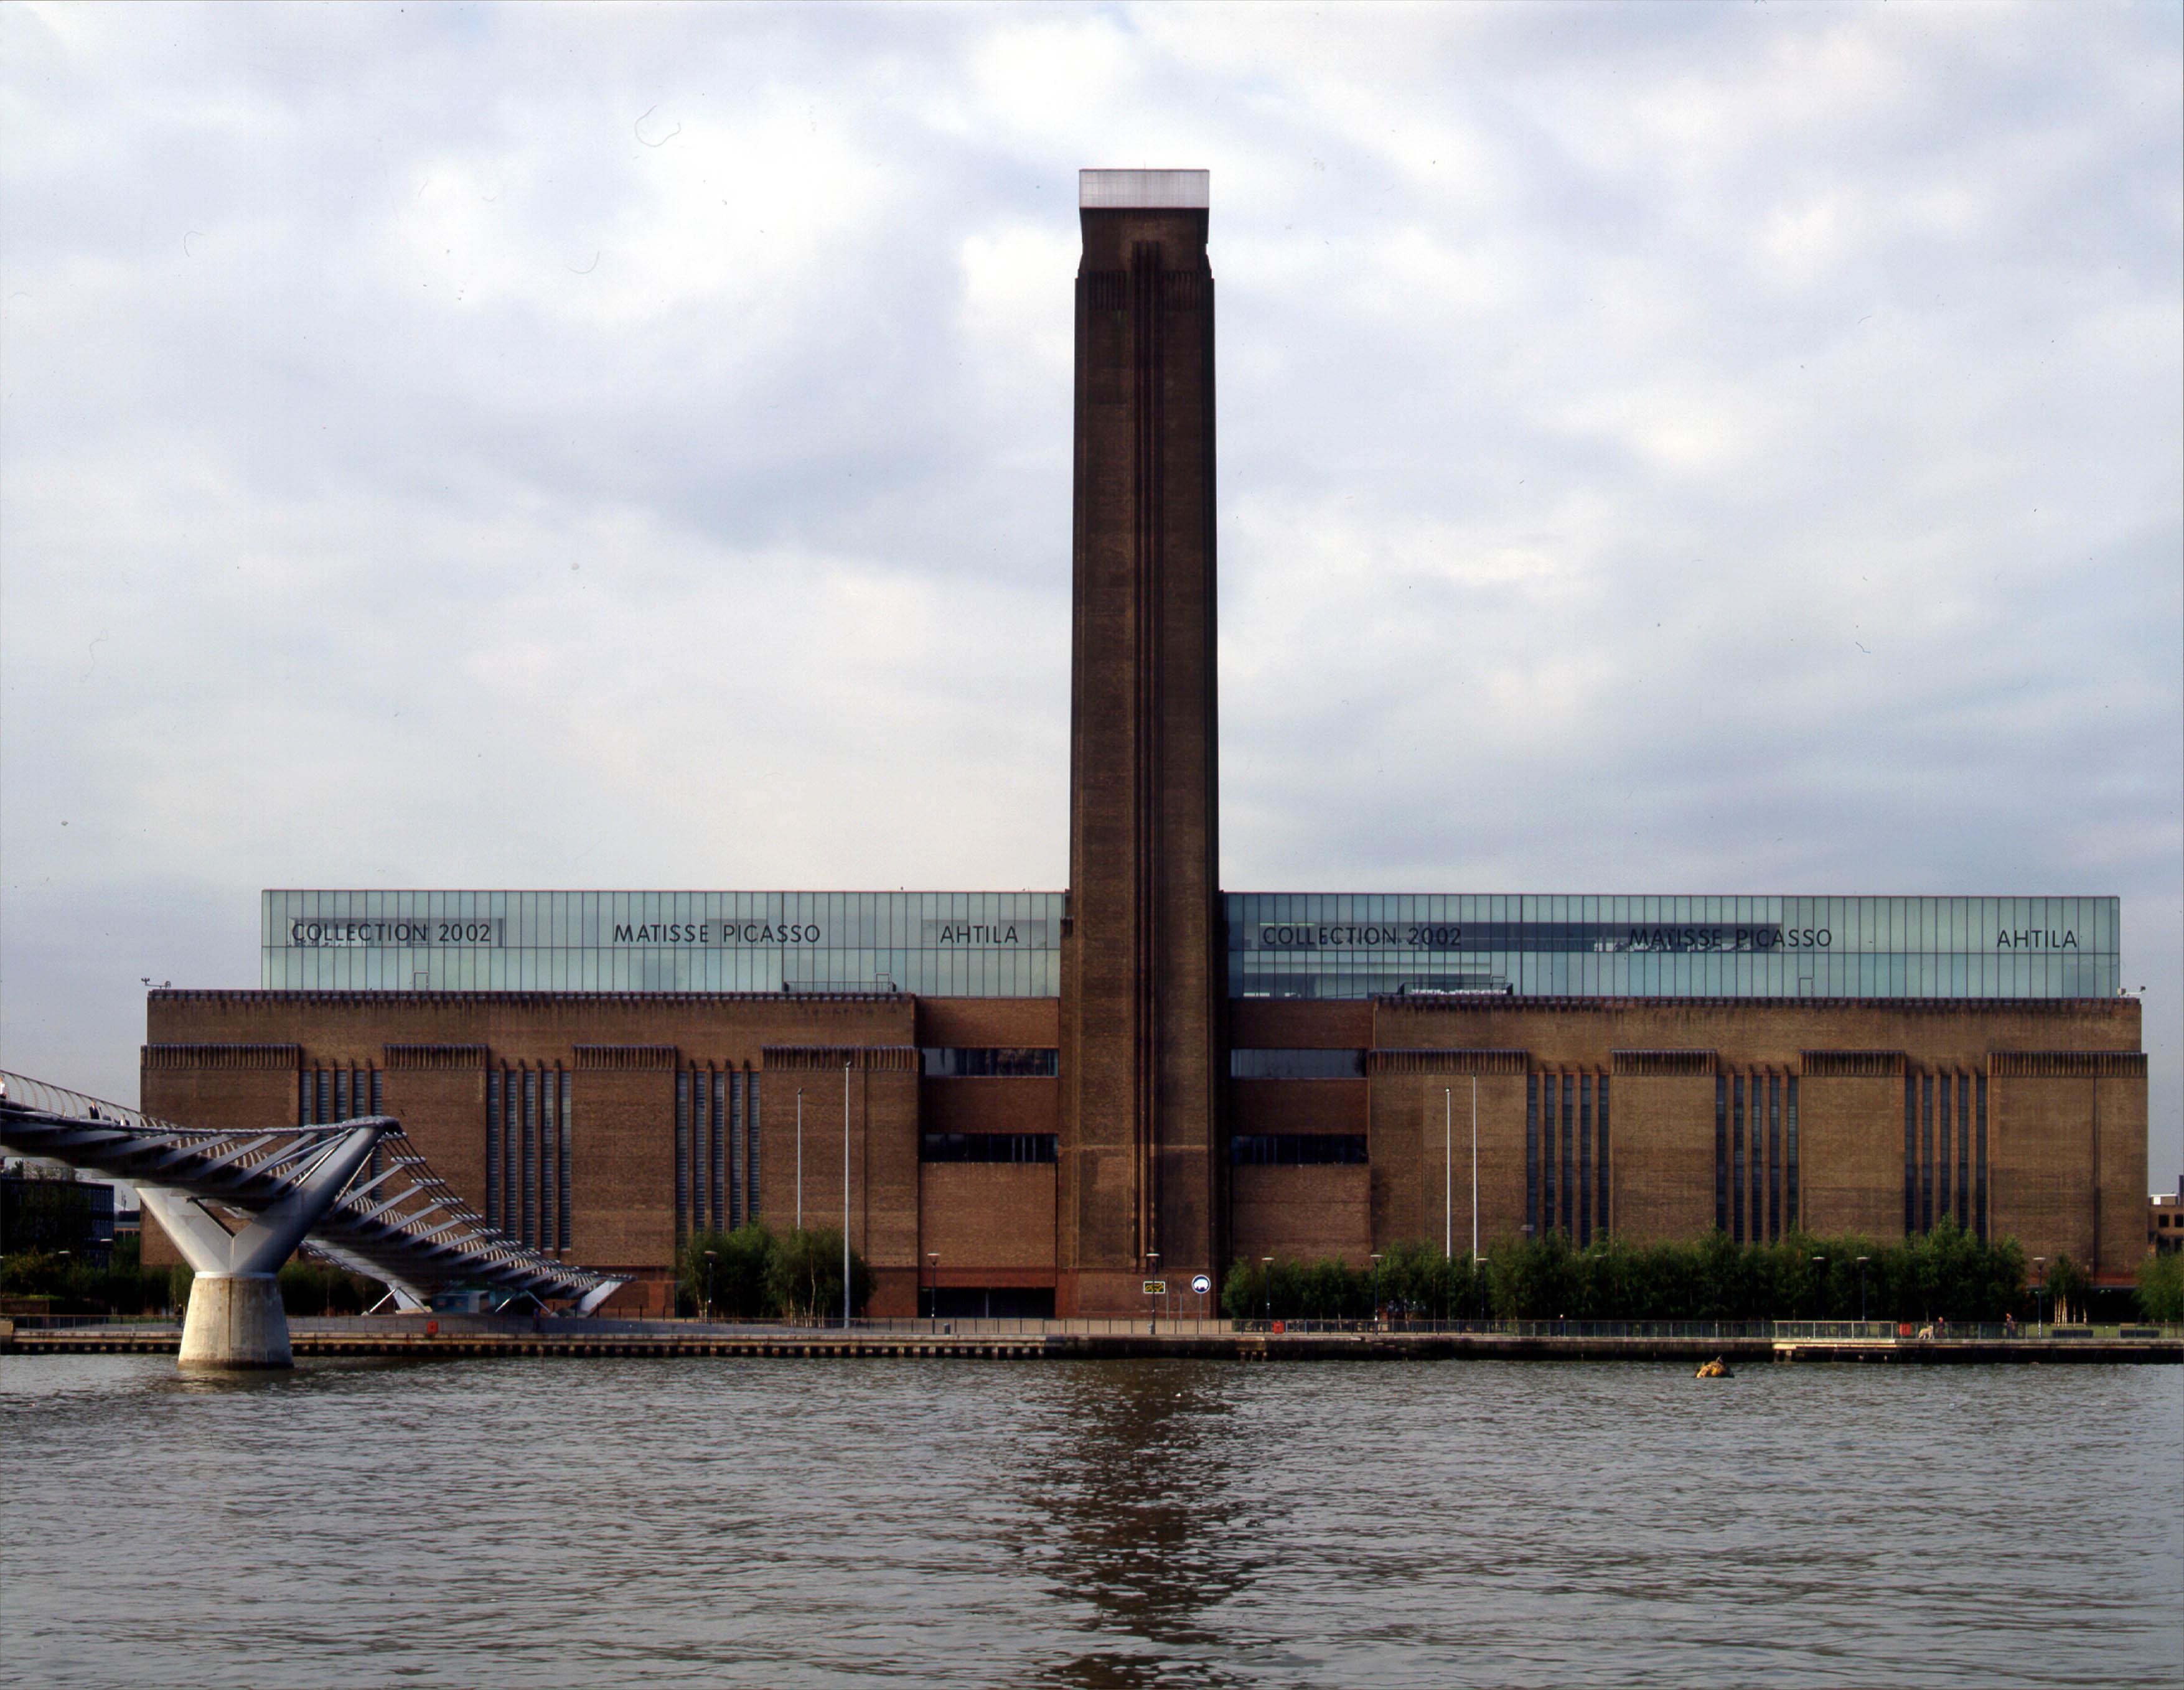 Tate Modern Has Overtaken The British Museum As The UKs